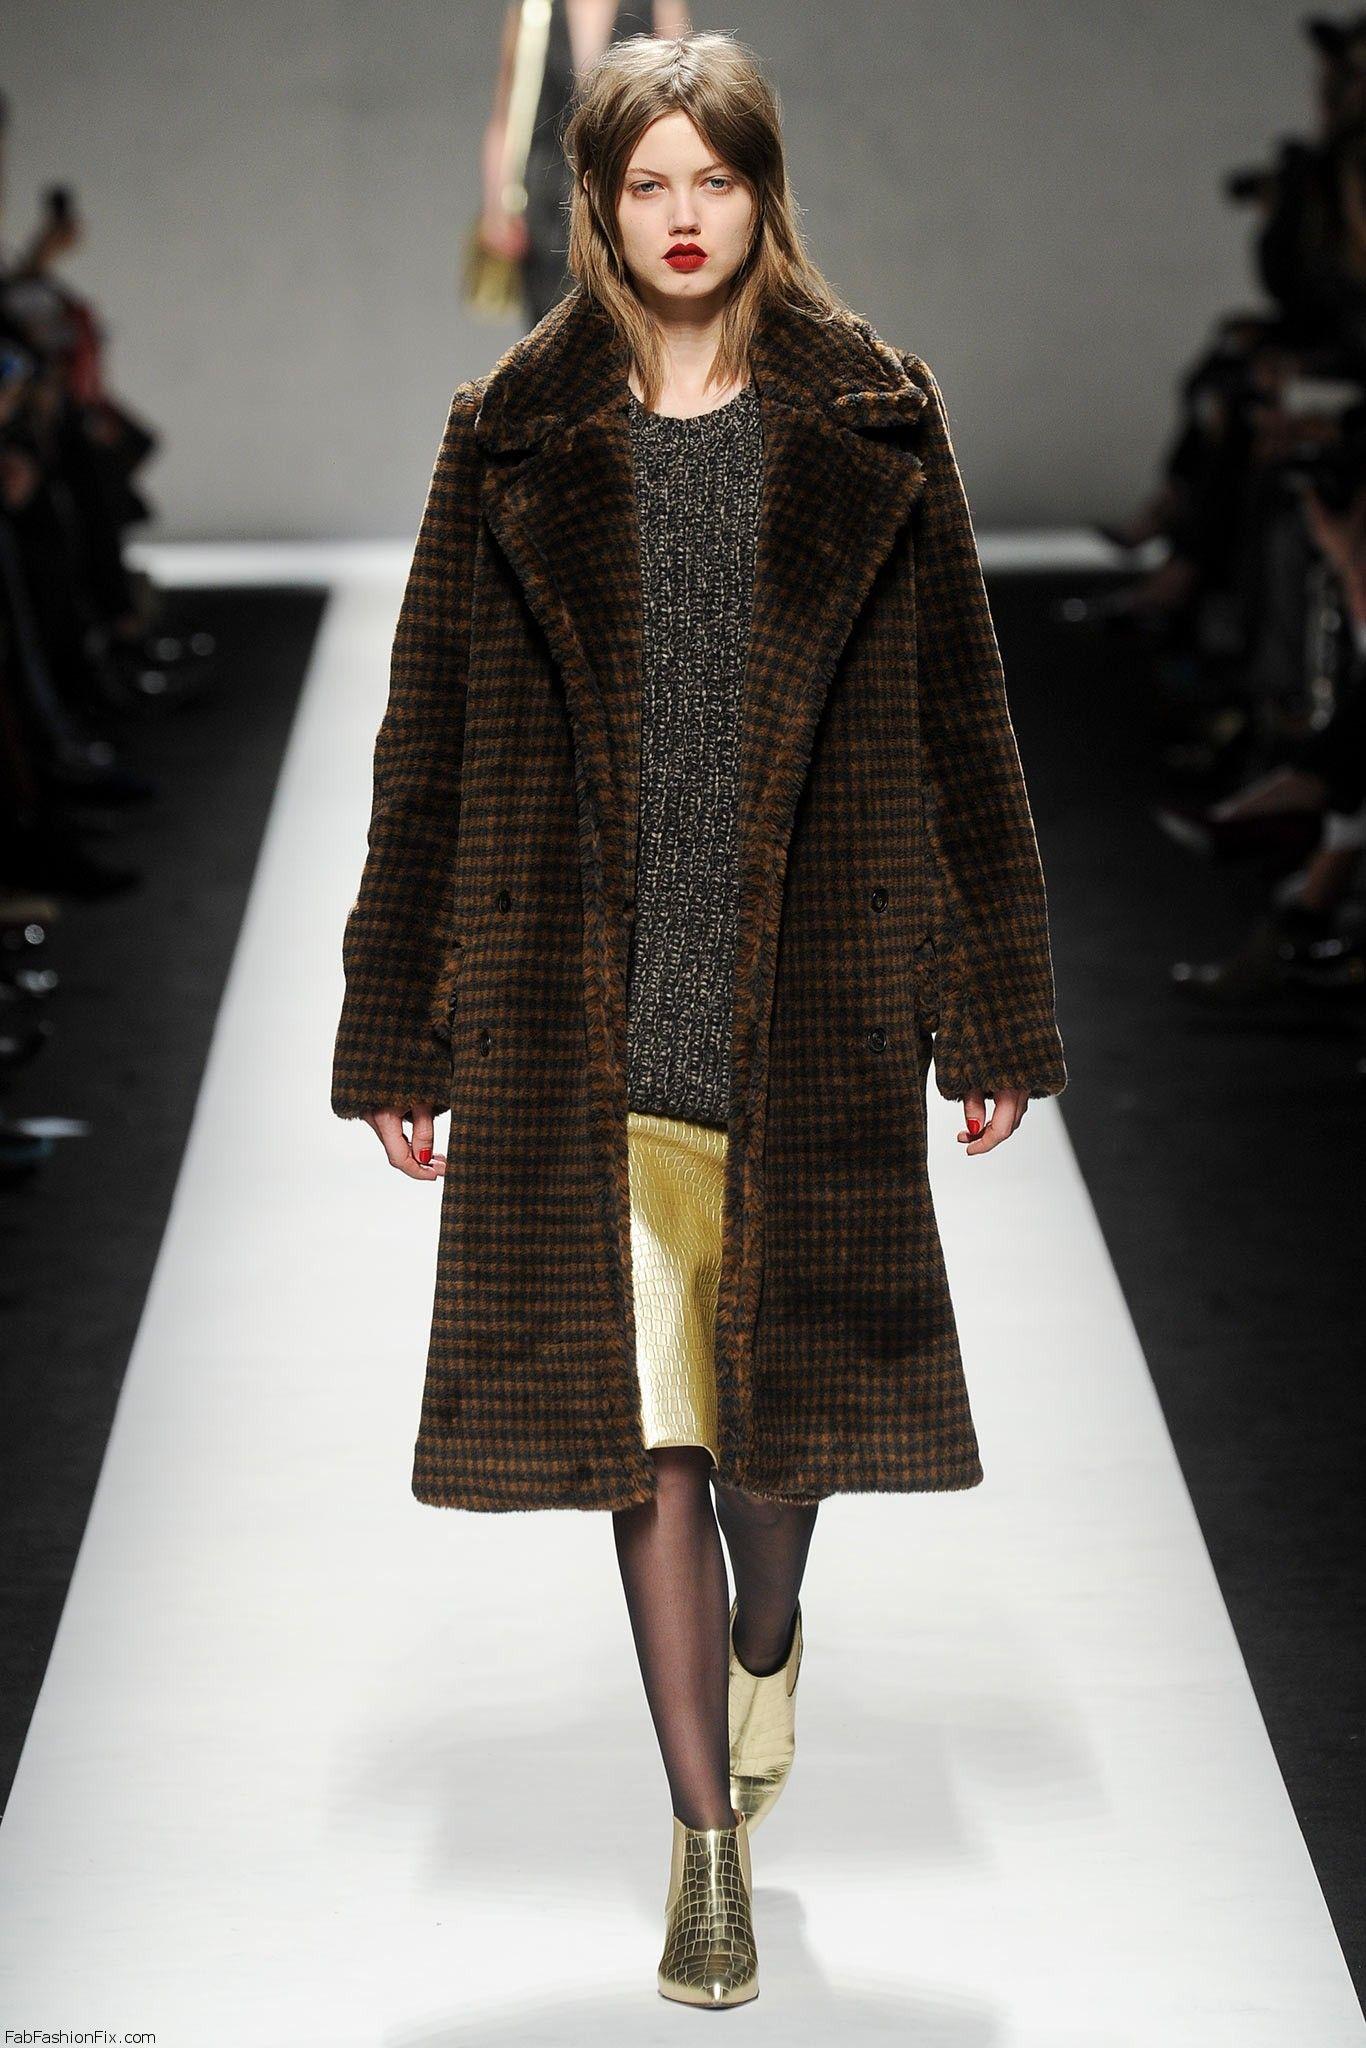 Max Mara fall/winter 2014 collection